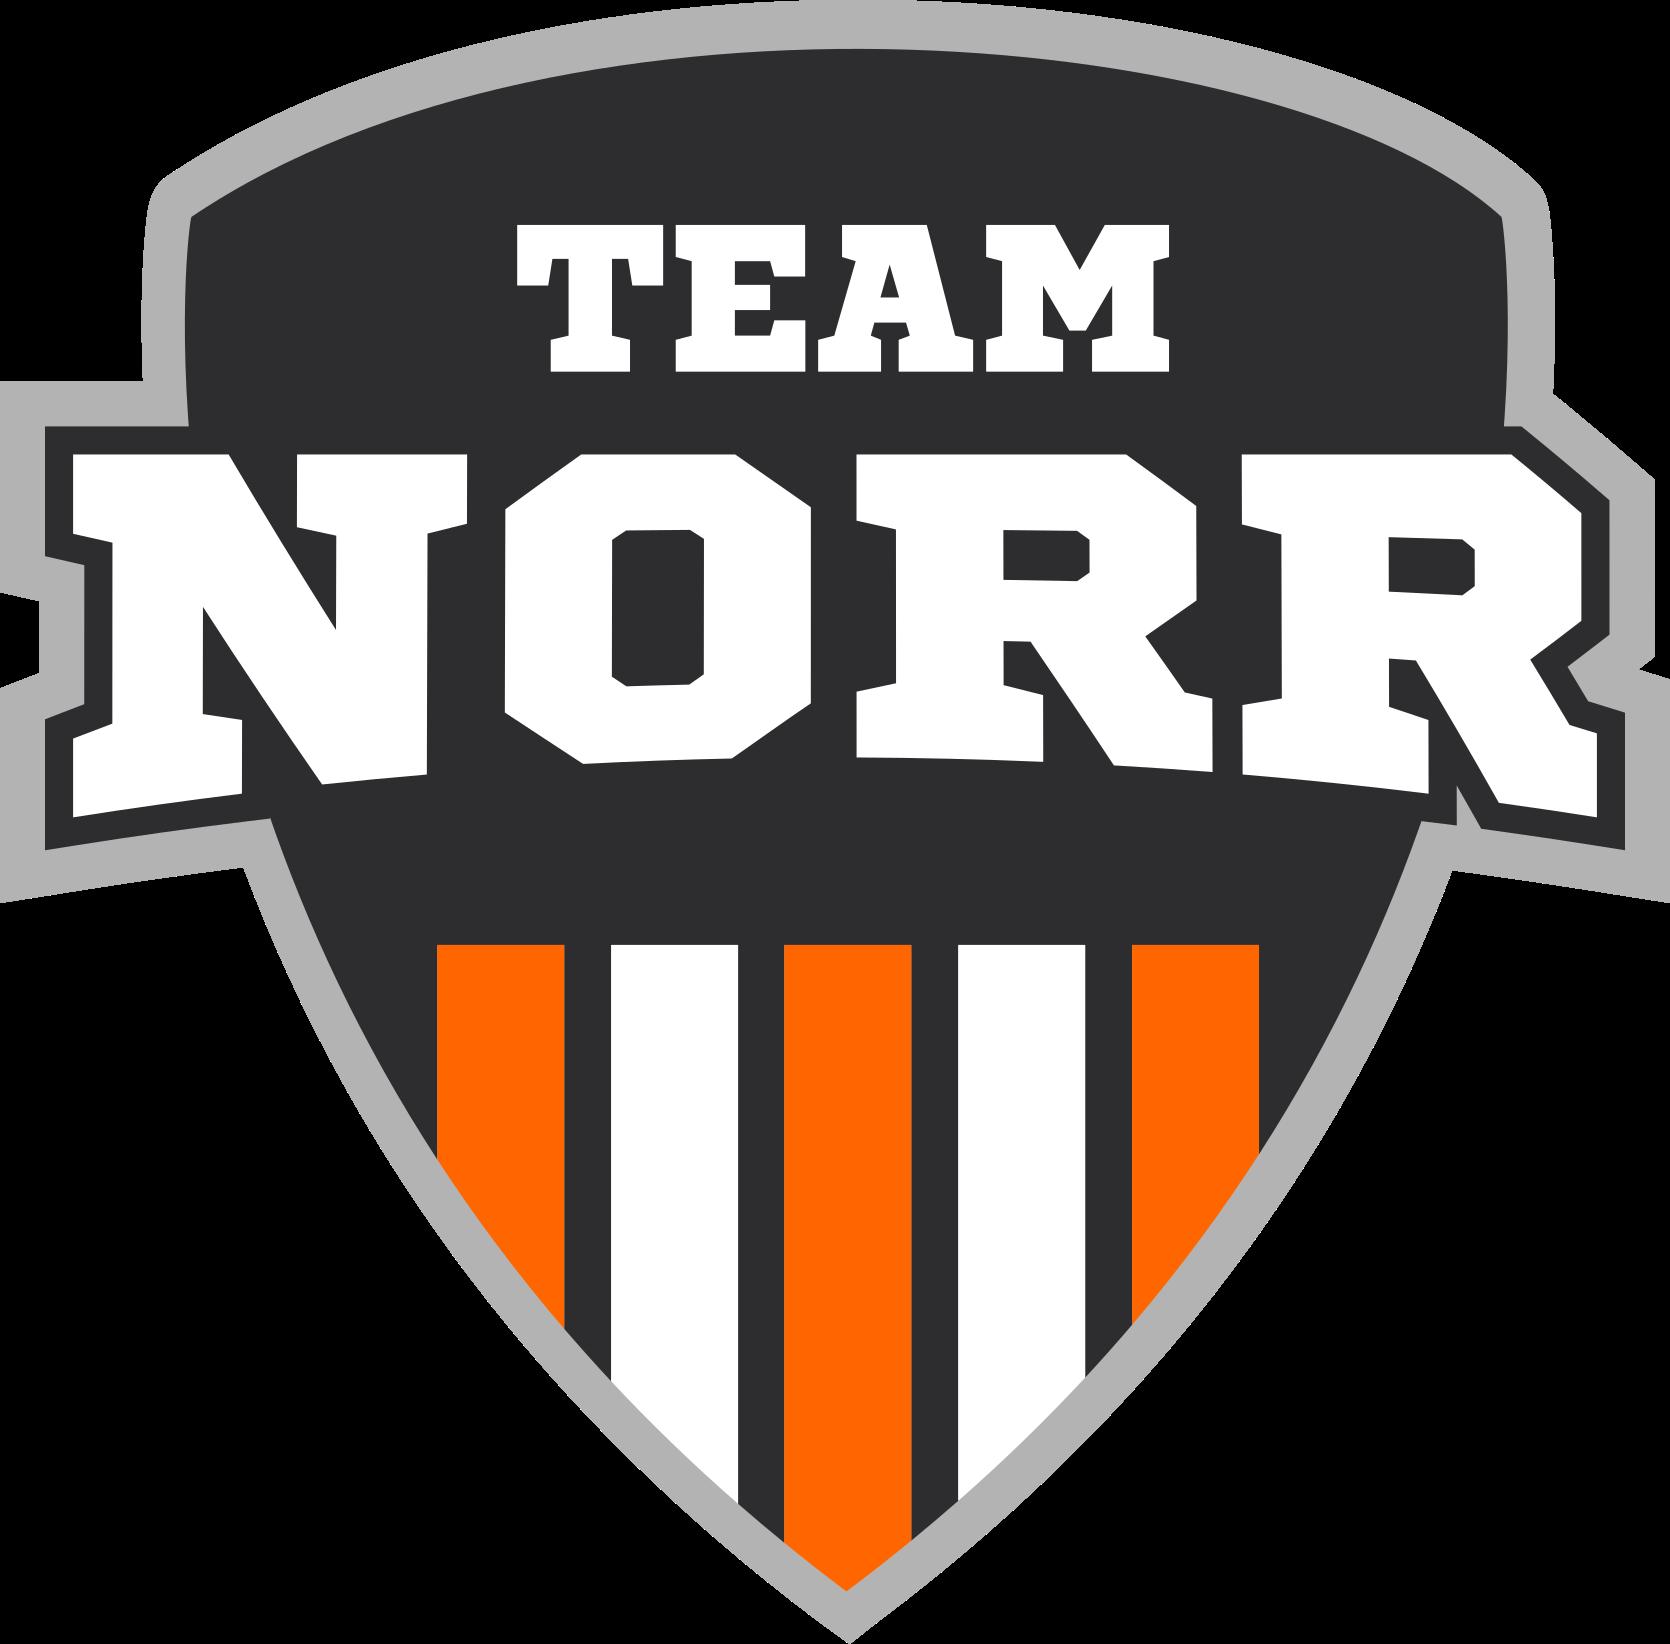 TeamNorr It-partner